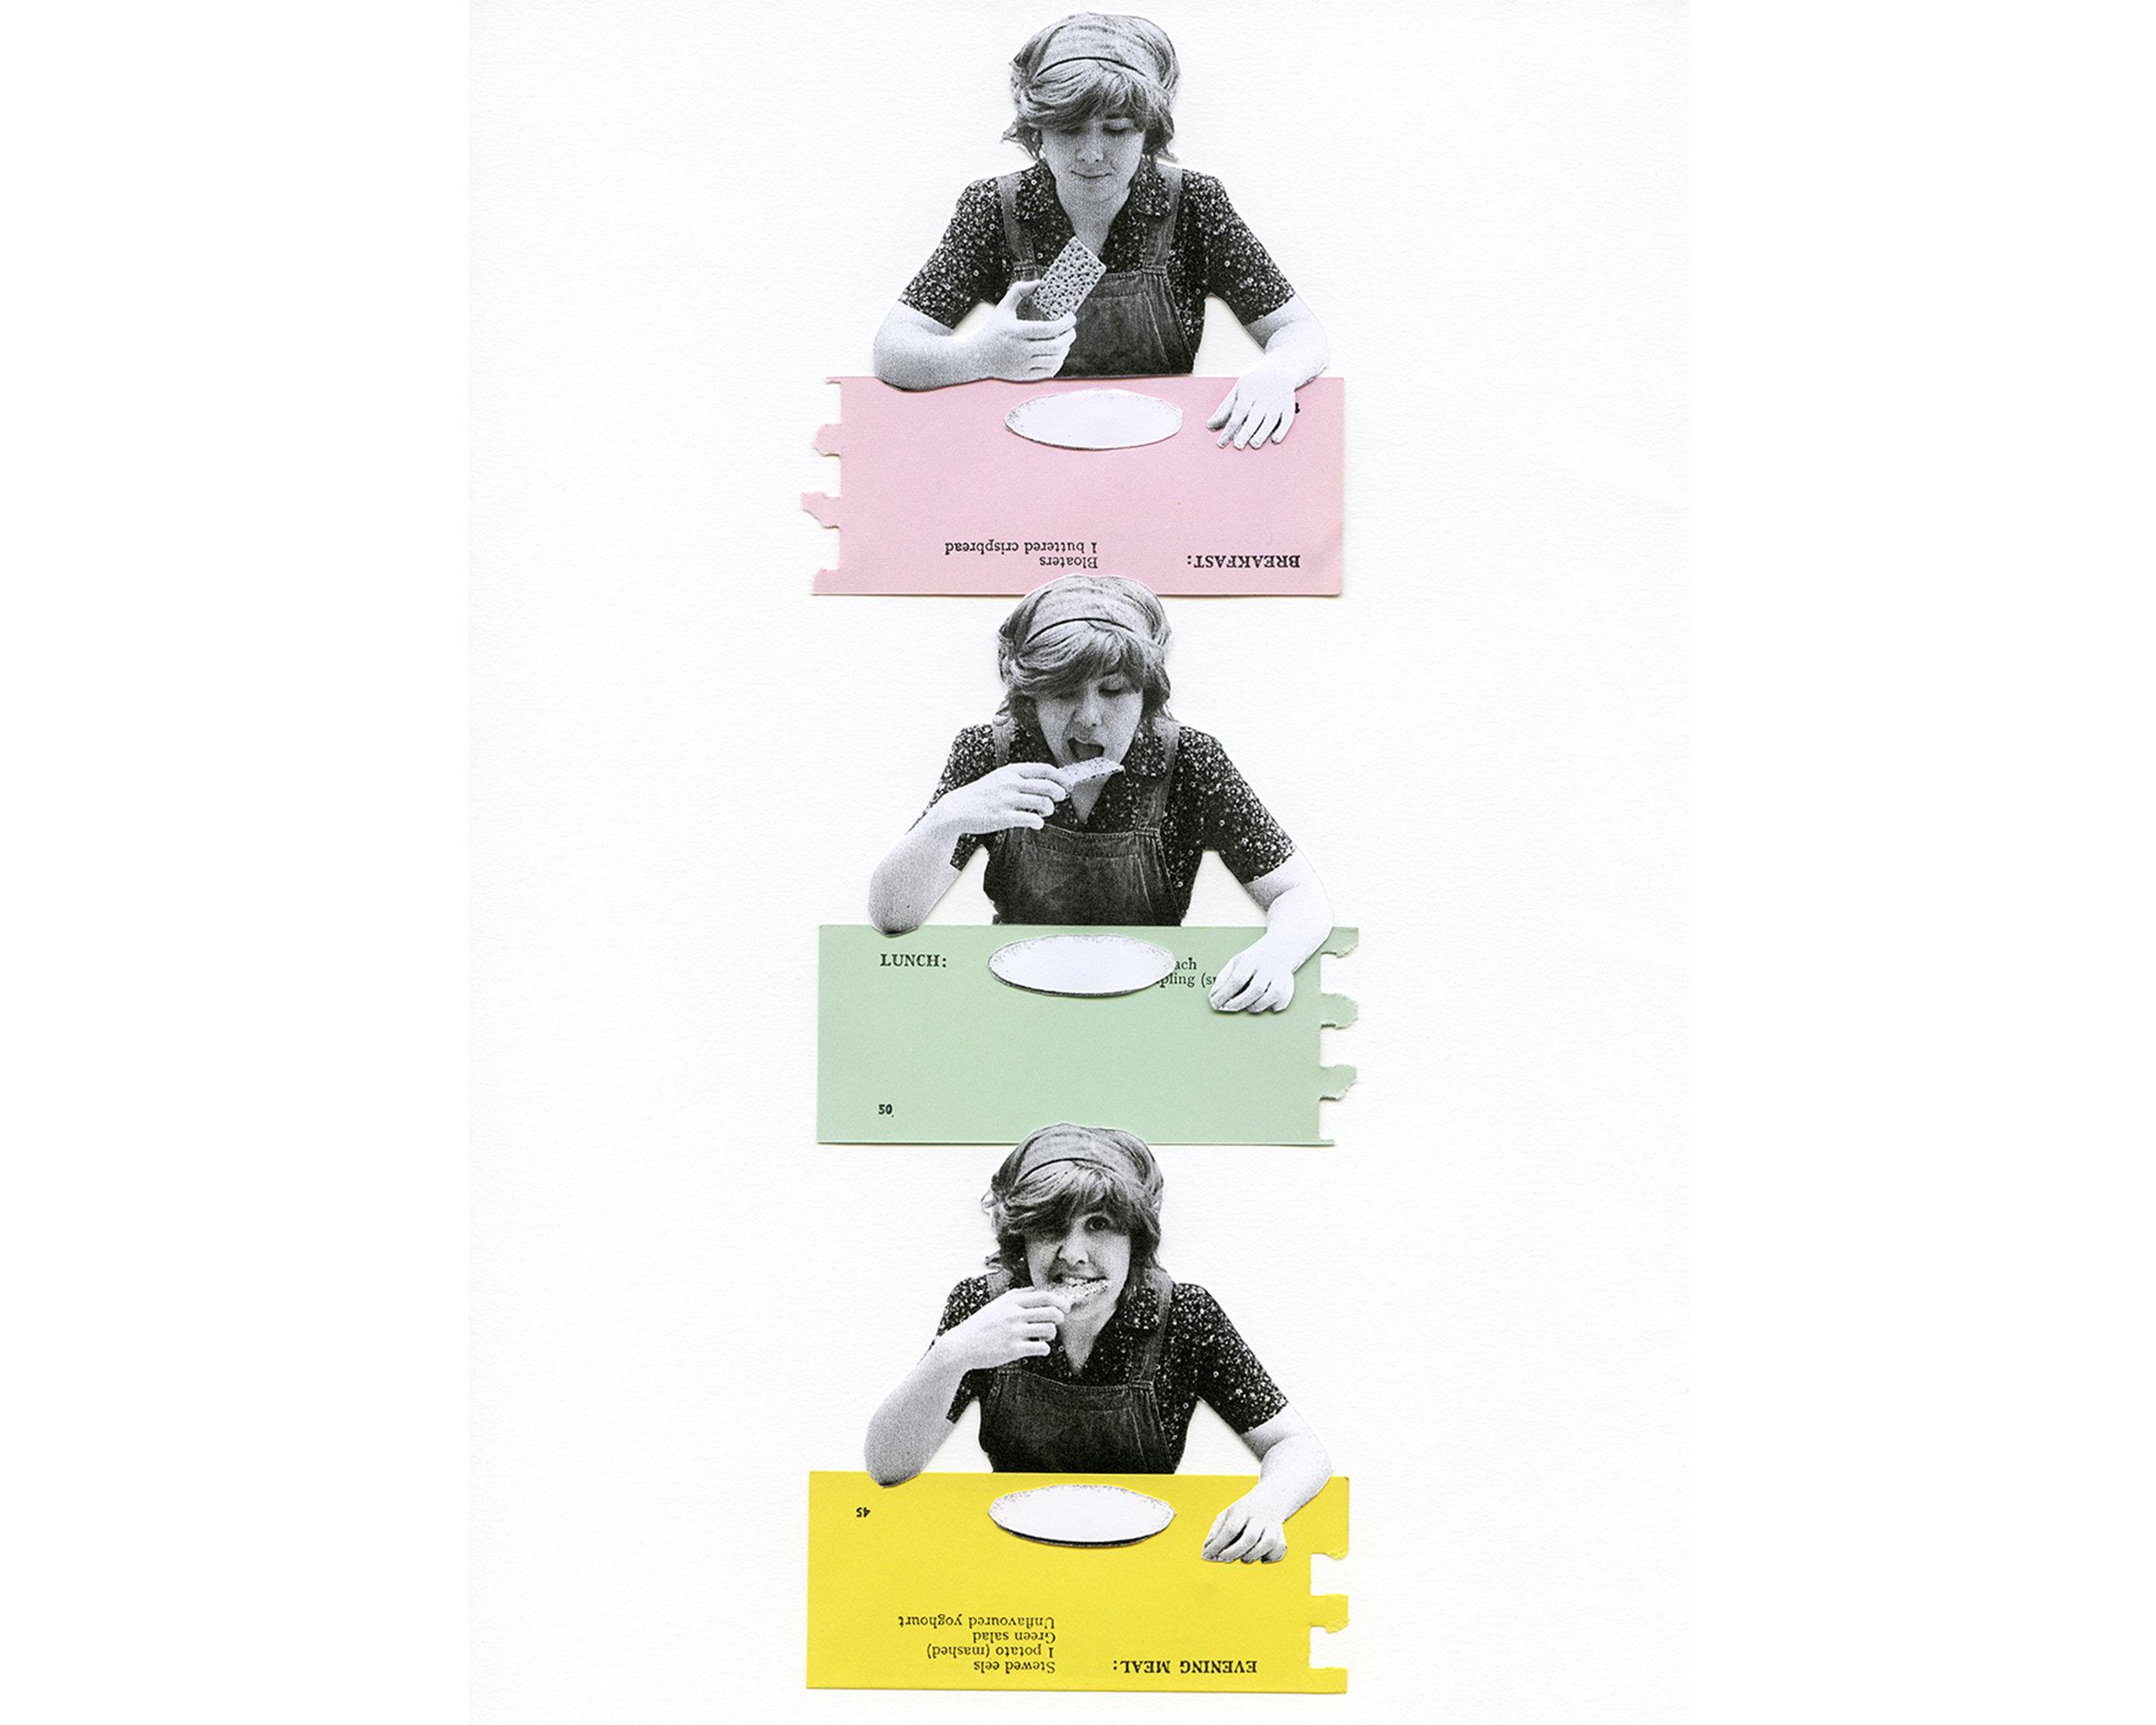 Nine Slices 3 10x8 web.jpg